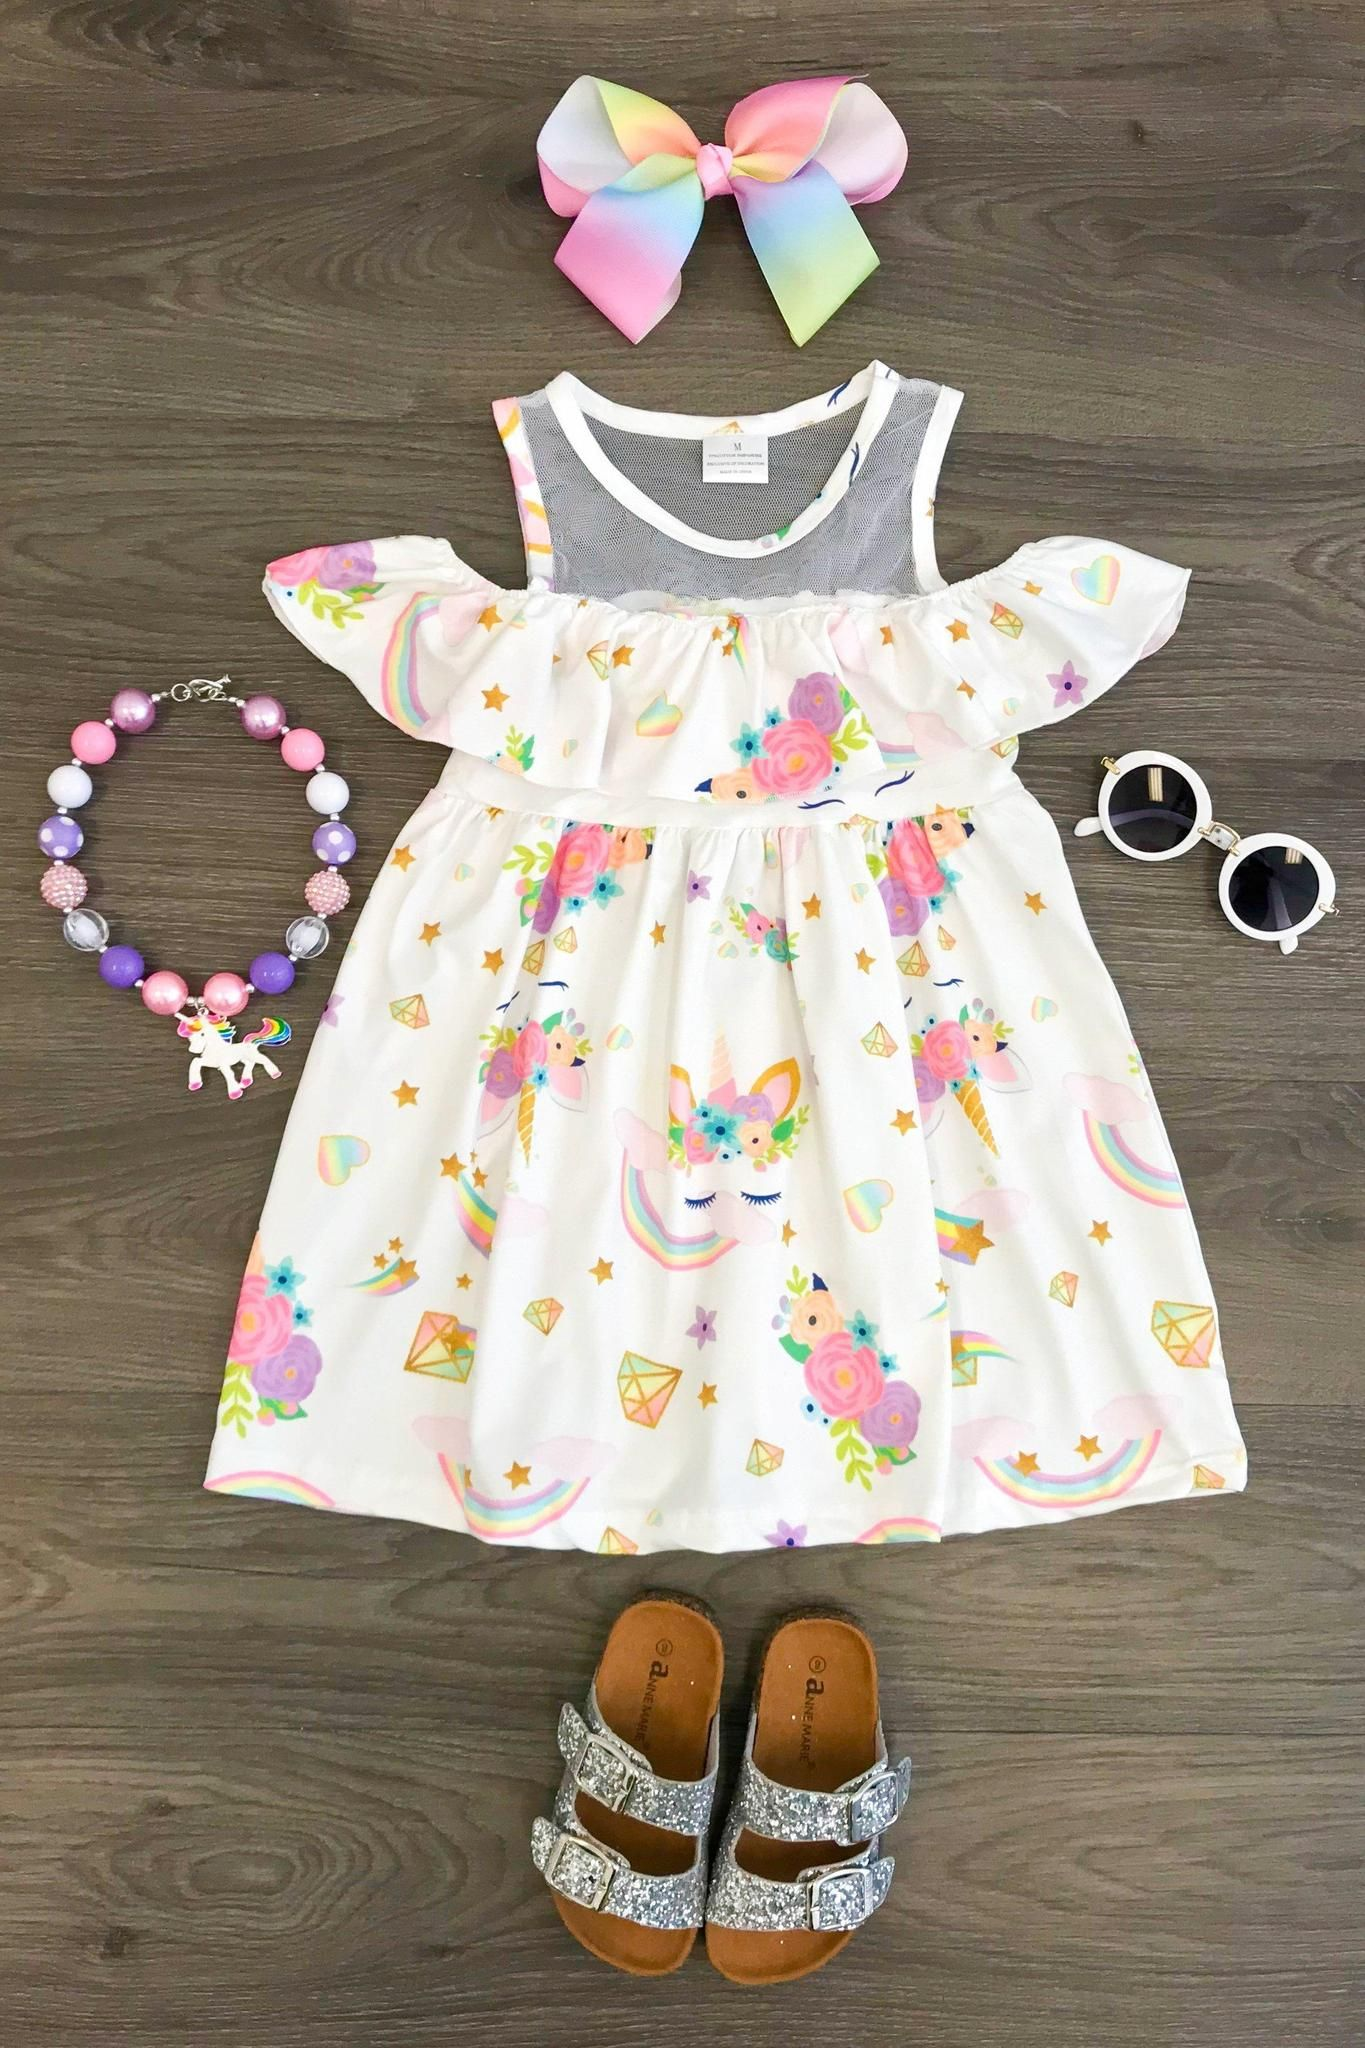 c62e7549d57fb White Unicorn Off Shoulder Dress   Unicorn Party   Toddler dress ...